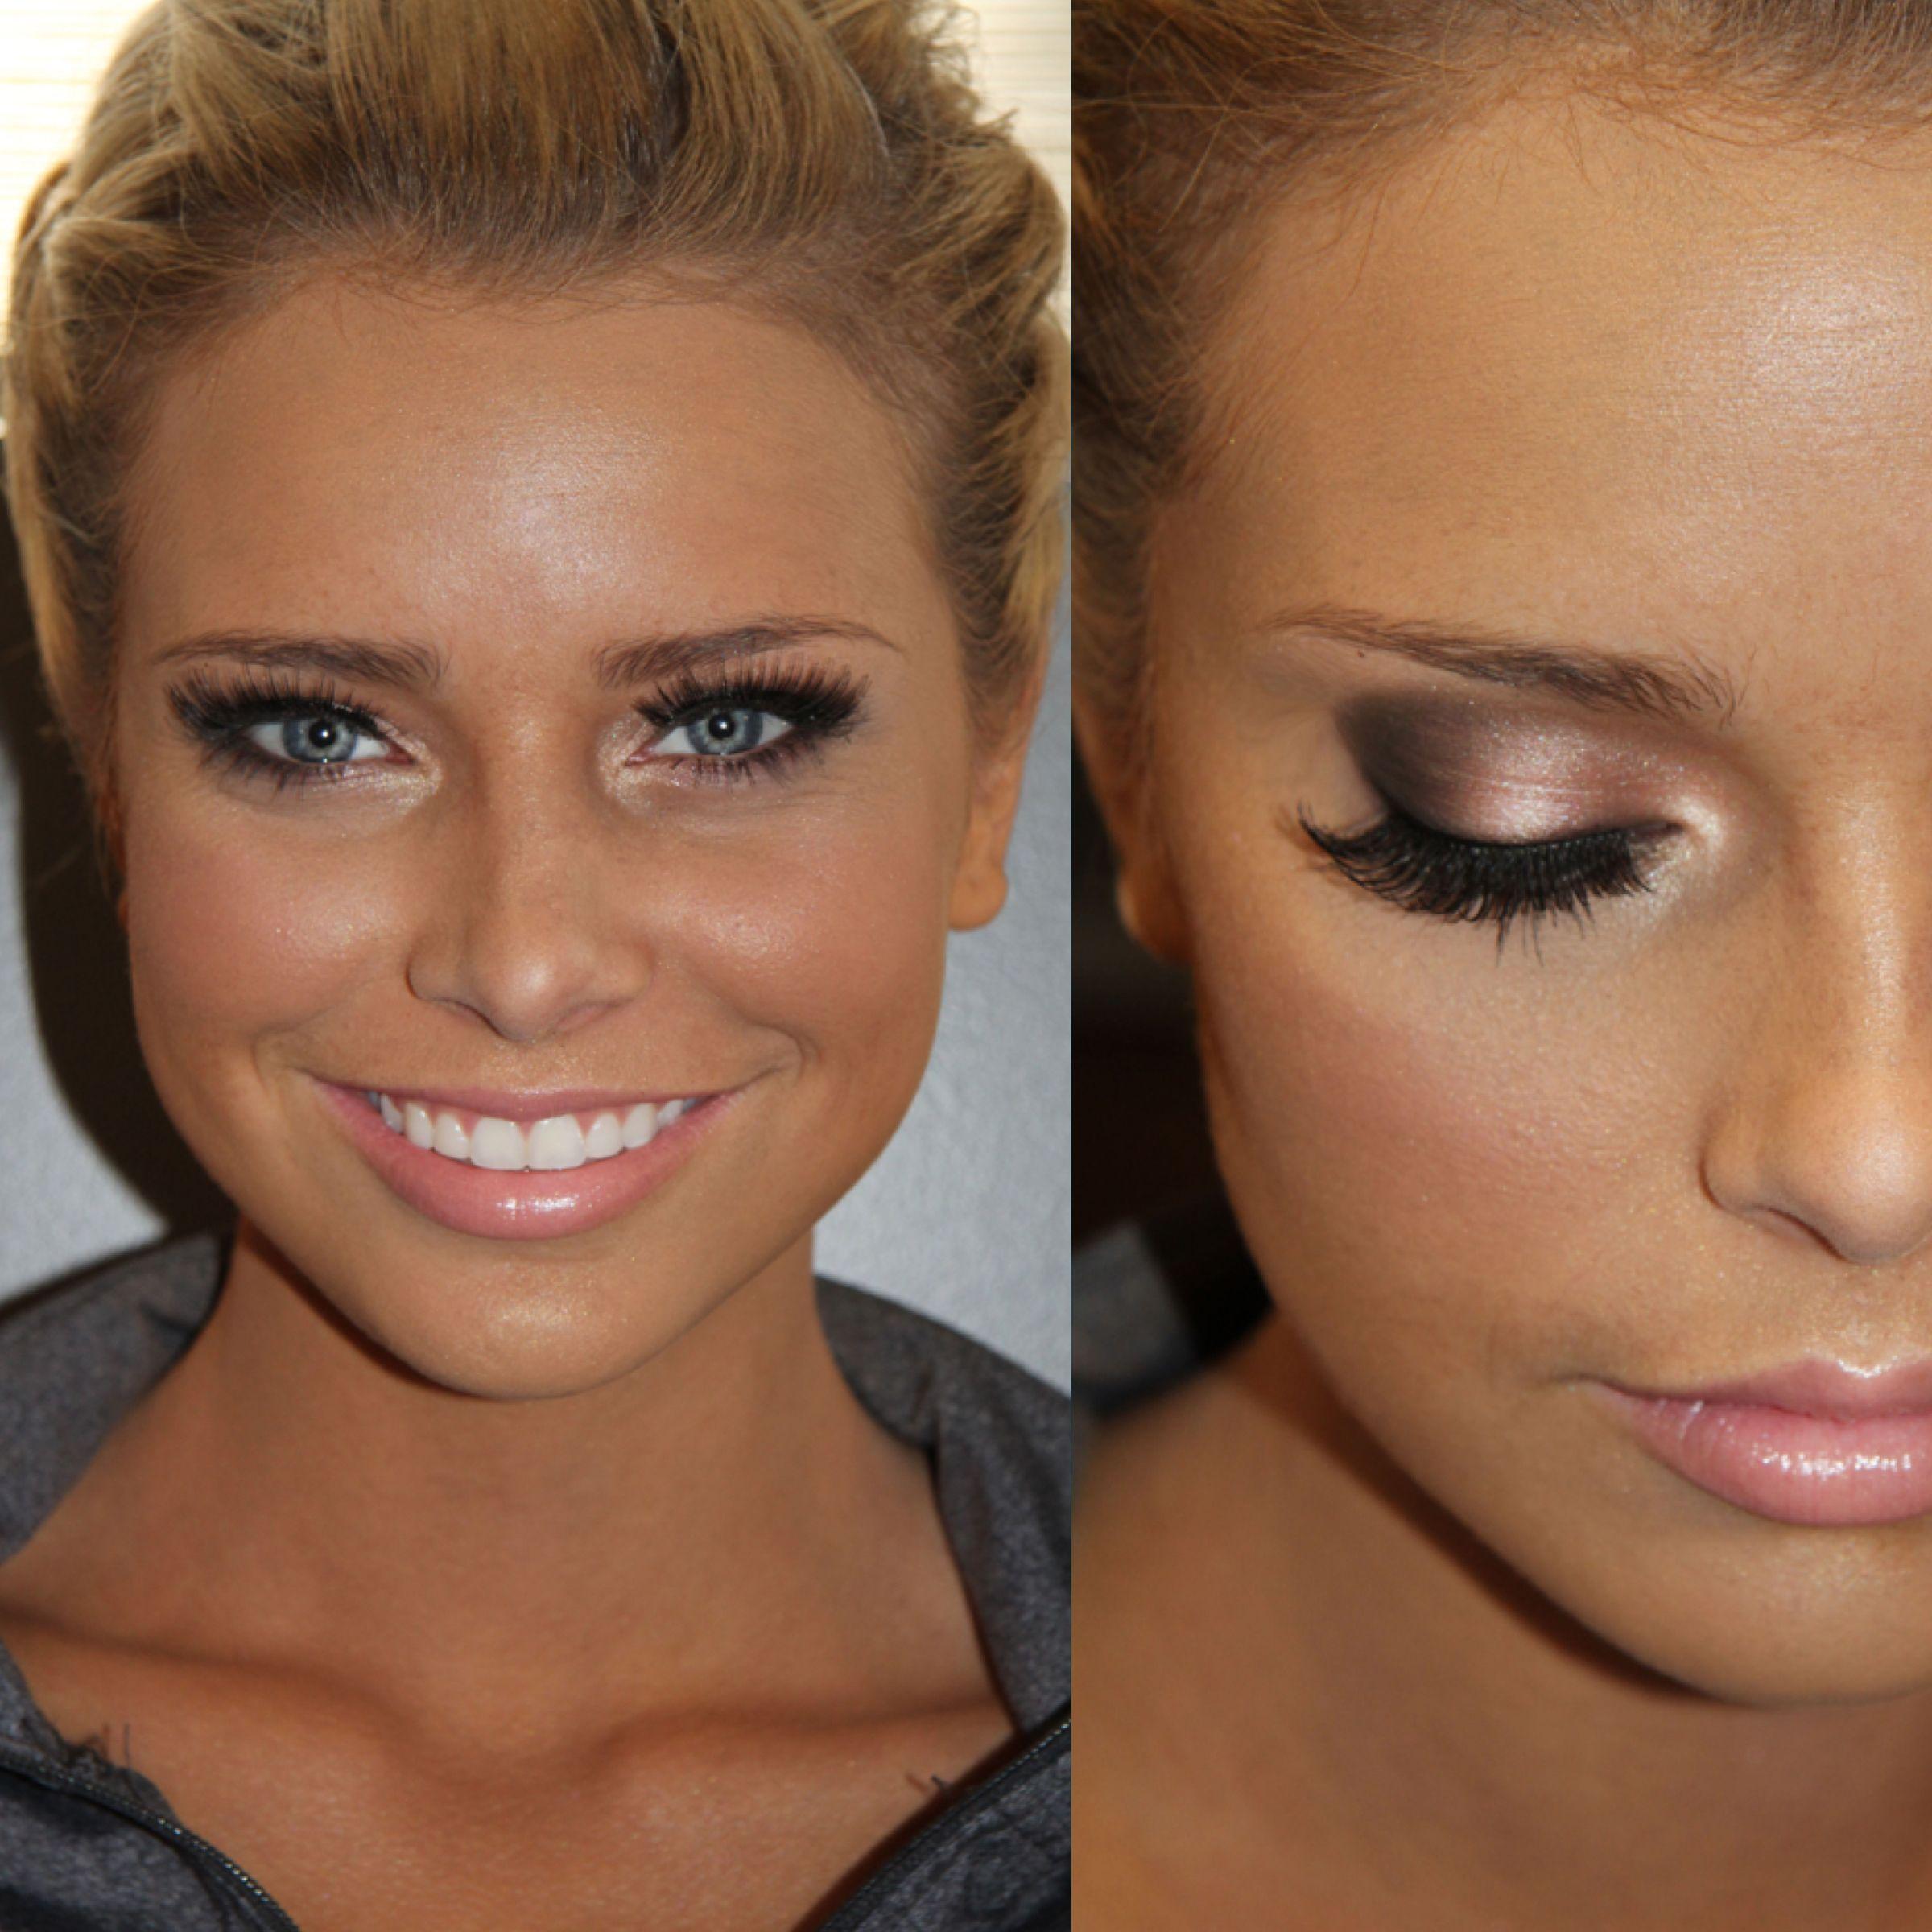 Wedding makeup Bronzed Airbrush bride and smokey gray eye makeup